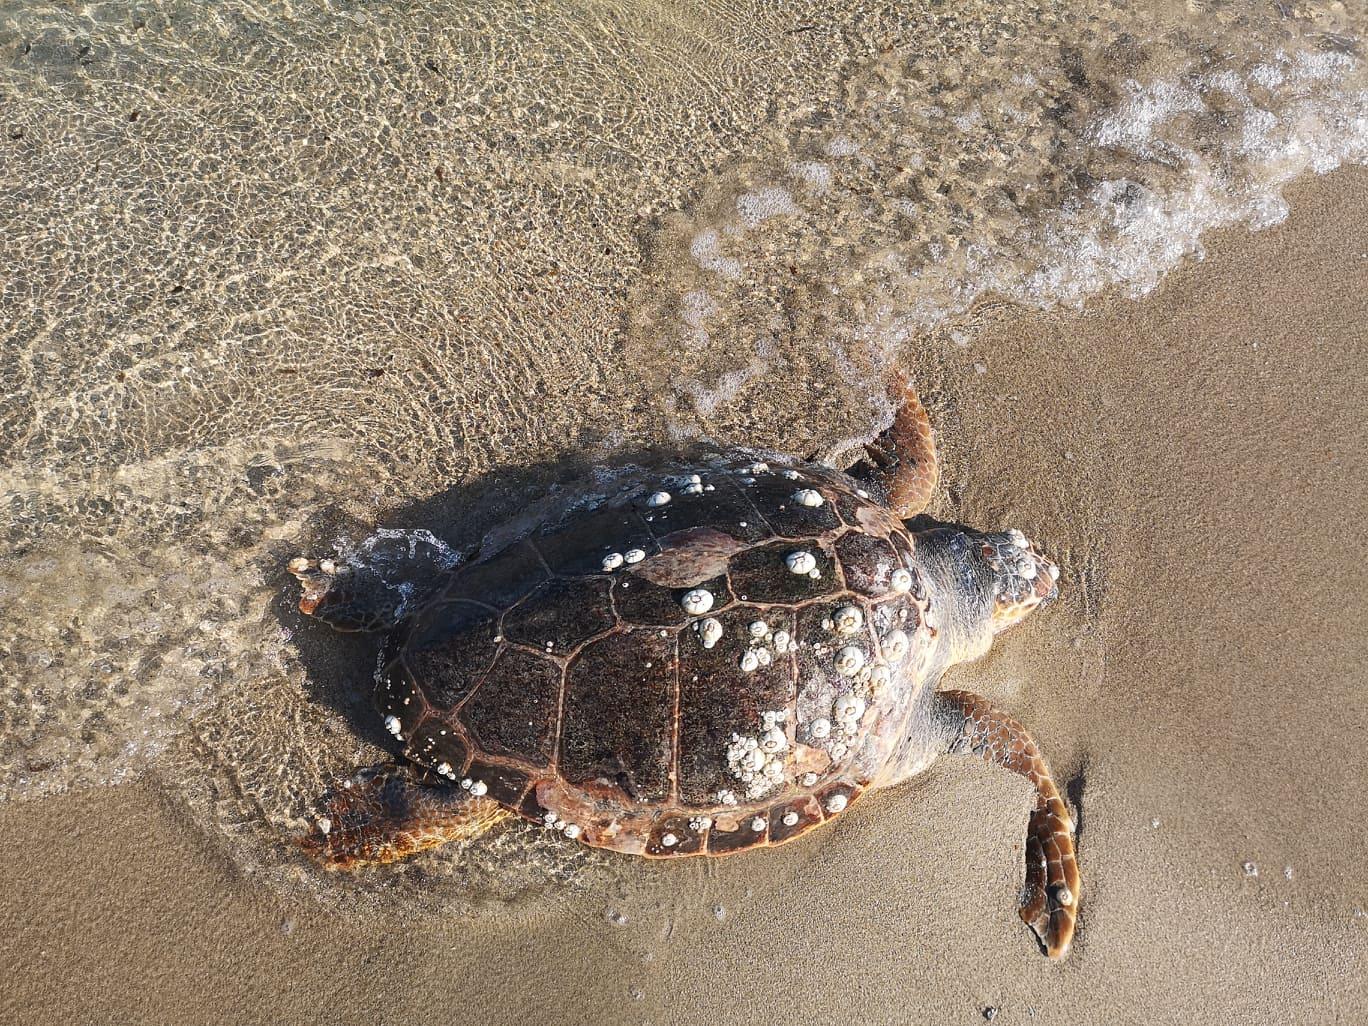 Una tartaruga morta spiaggiata a Torre Rinalda